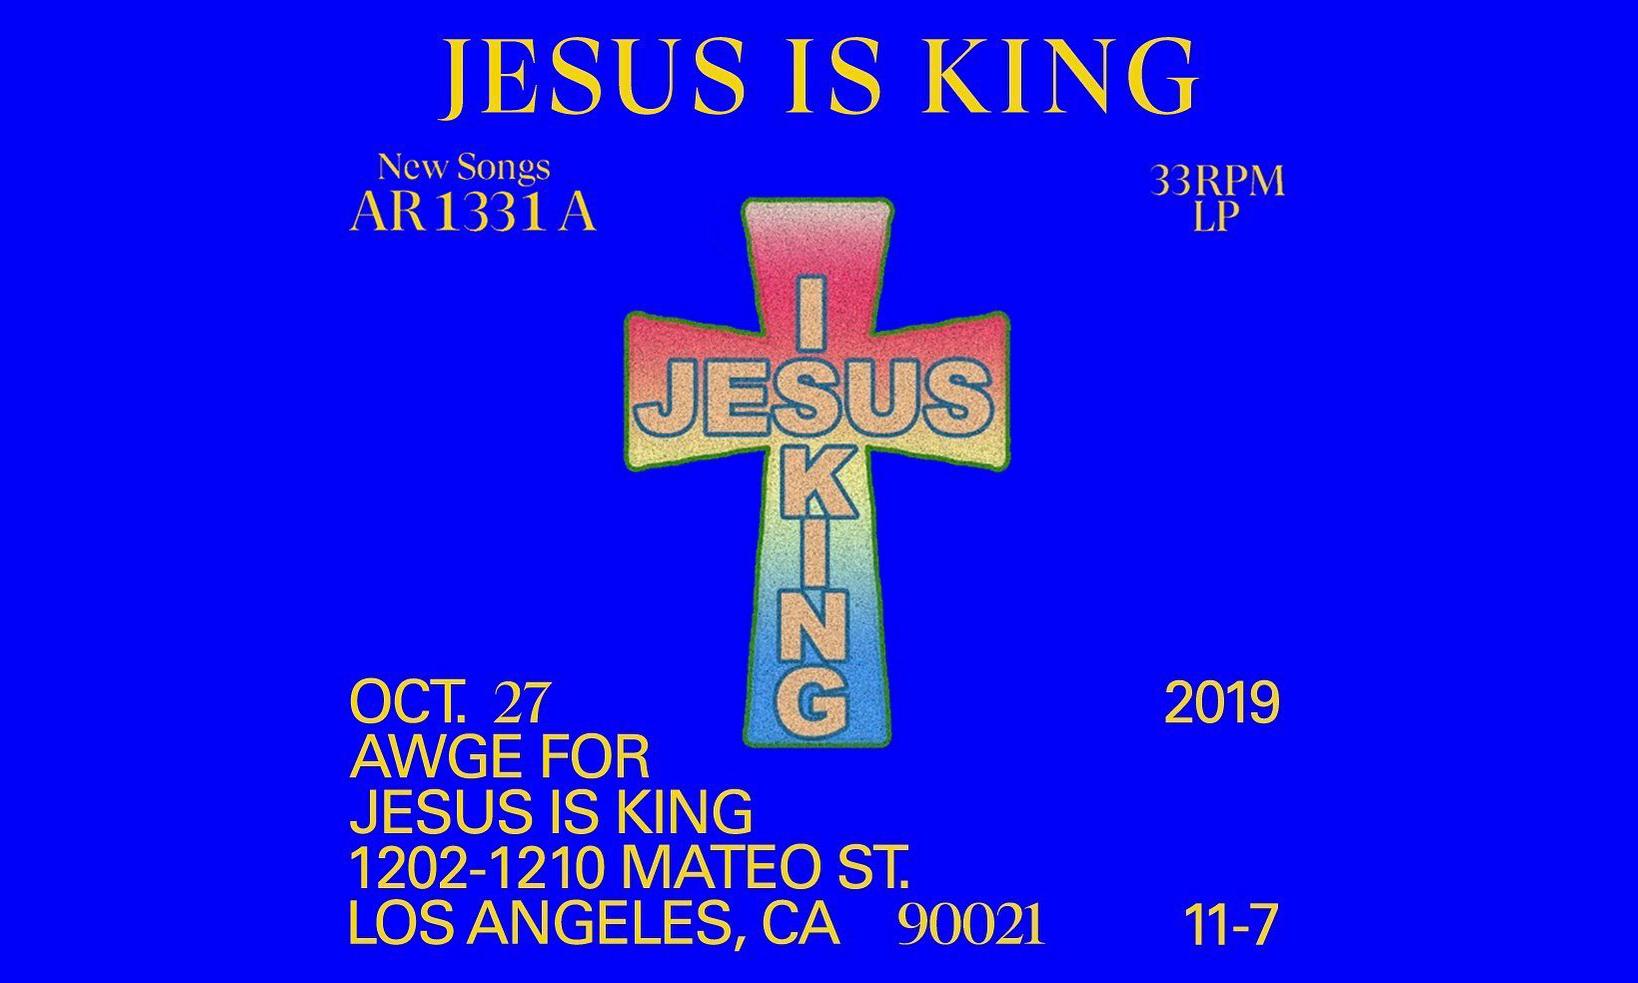 AWGE 为 Kanye West 新专辑《Jesus Is King》打造别注系列单品